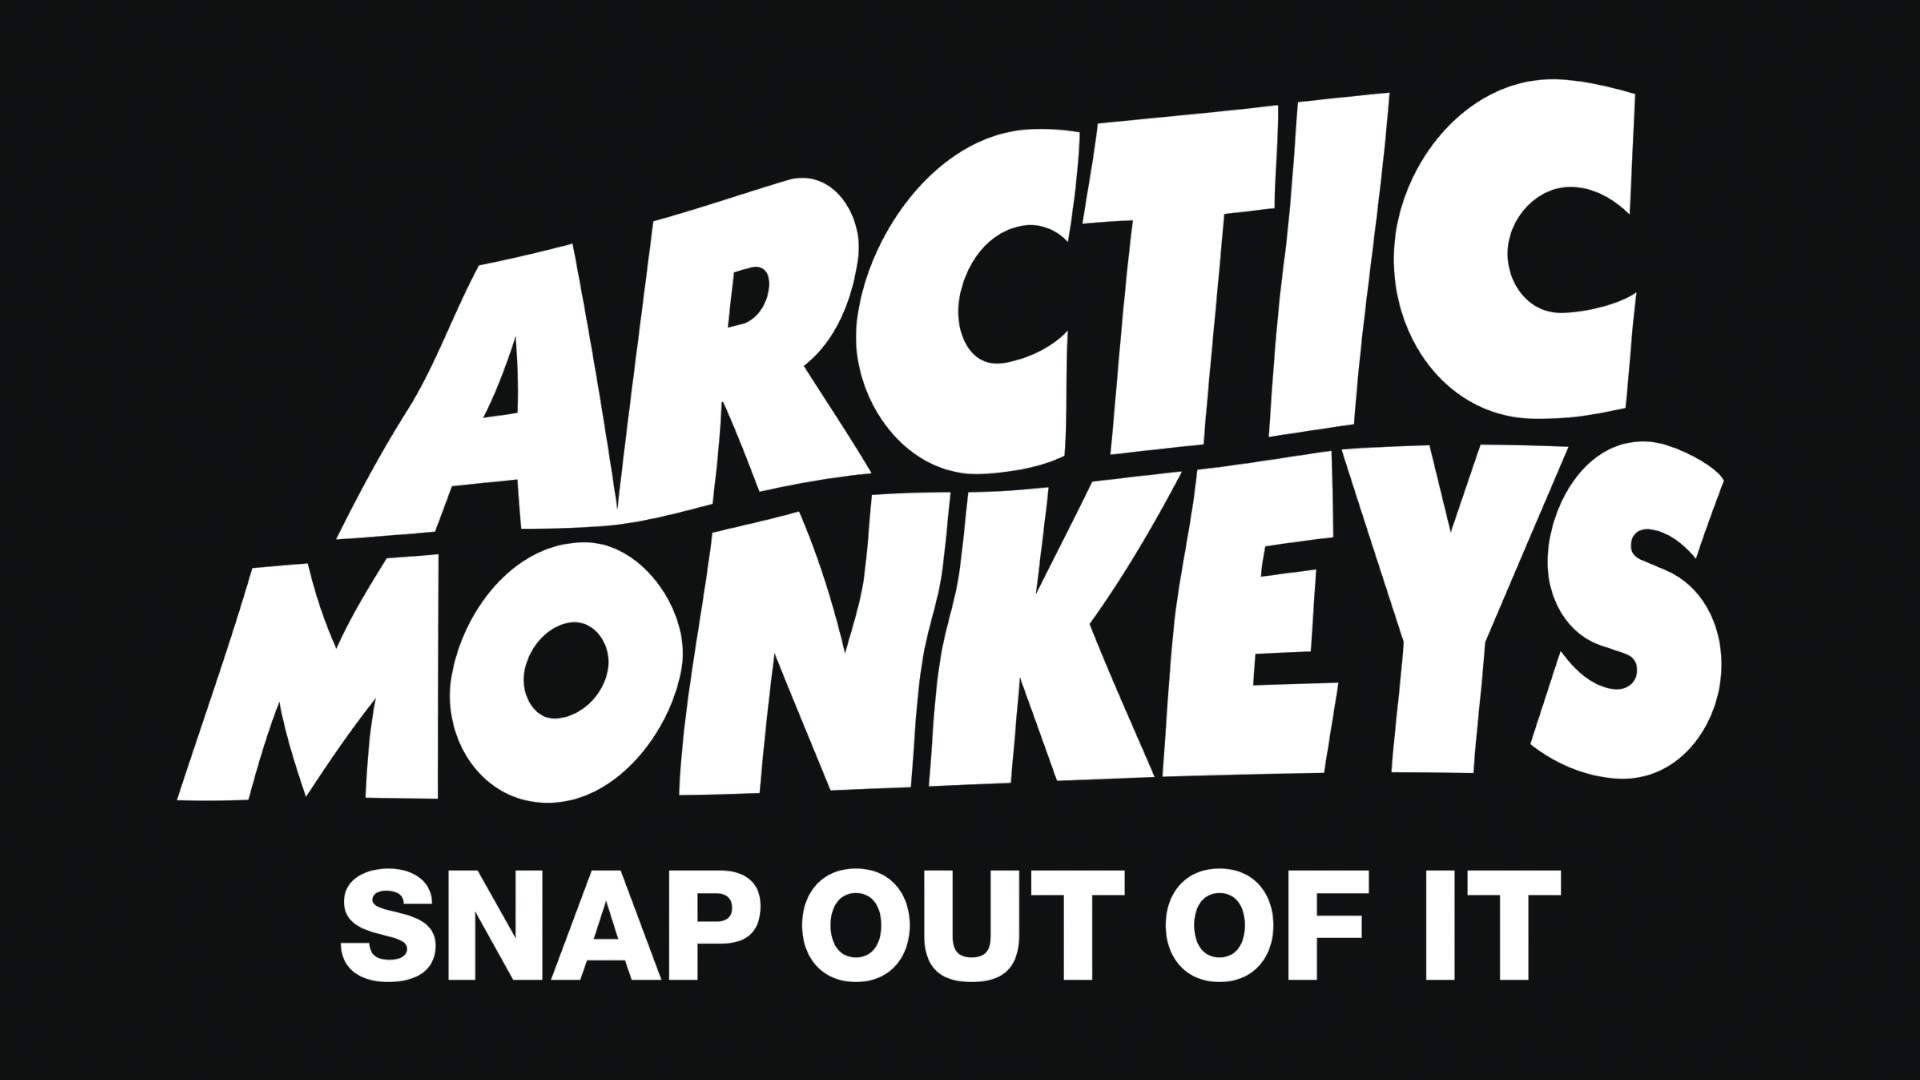 arctic monkeys wallpapers wallpaper cave